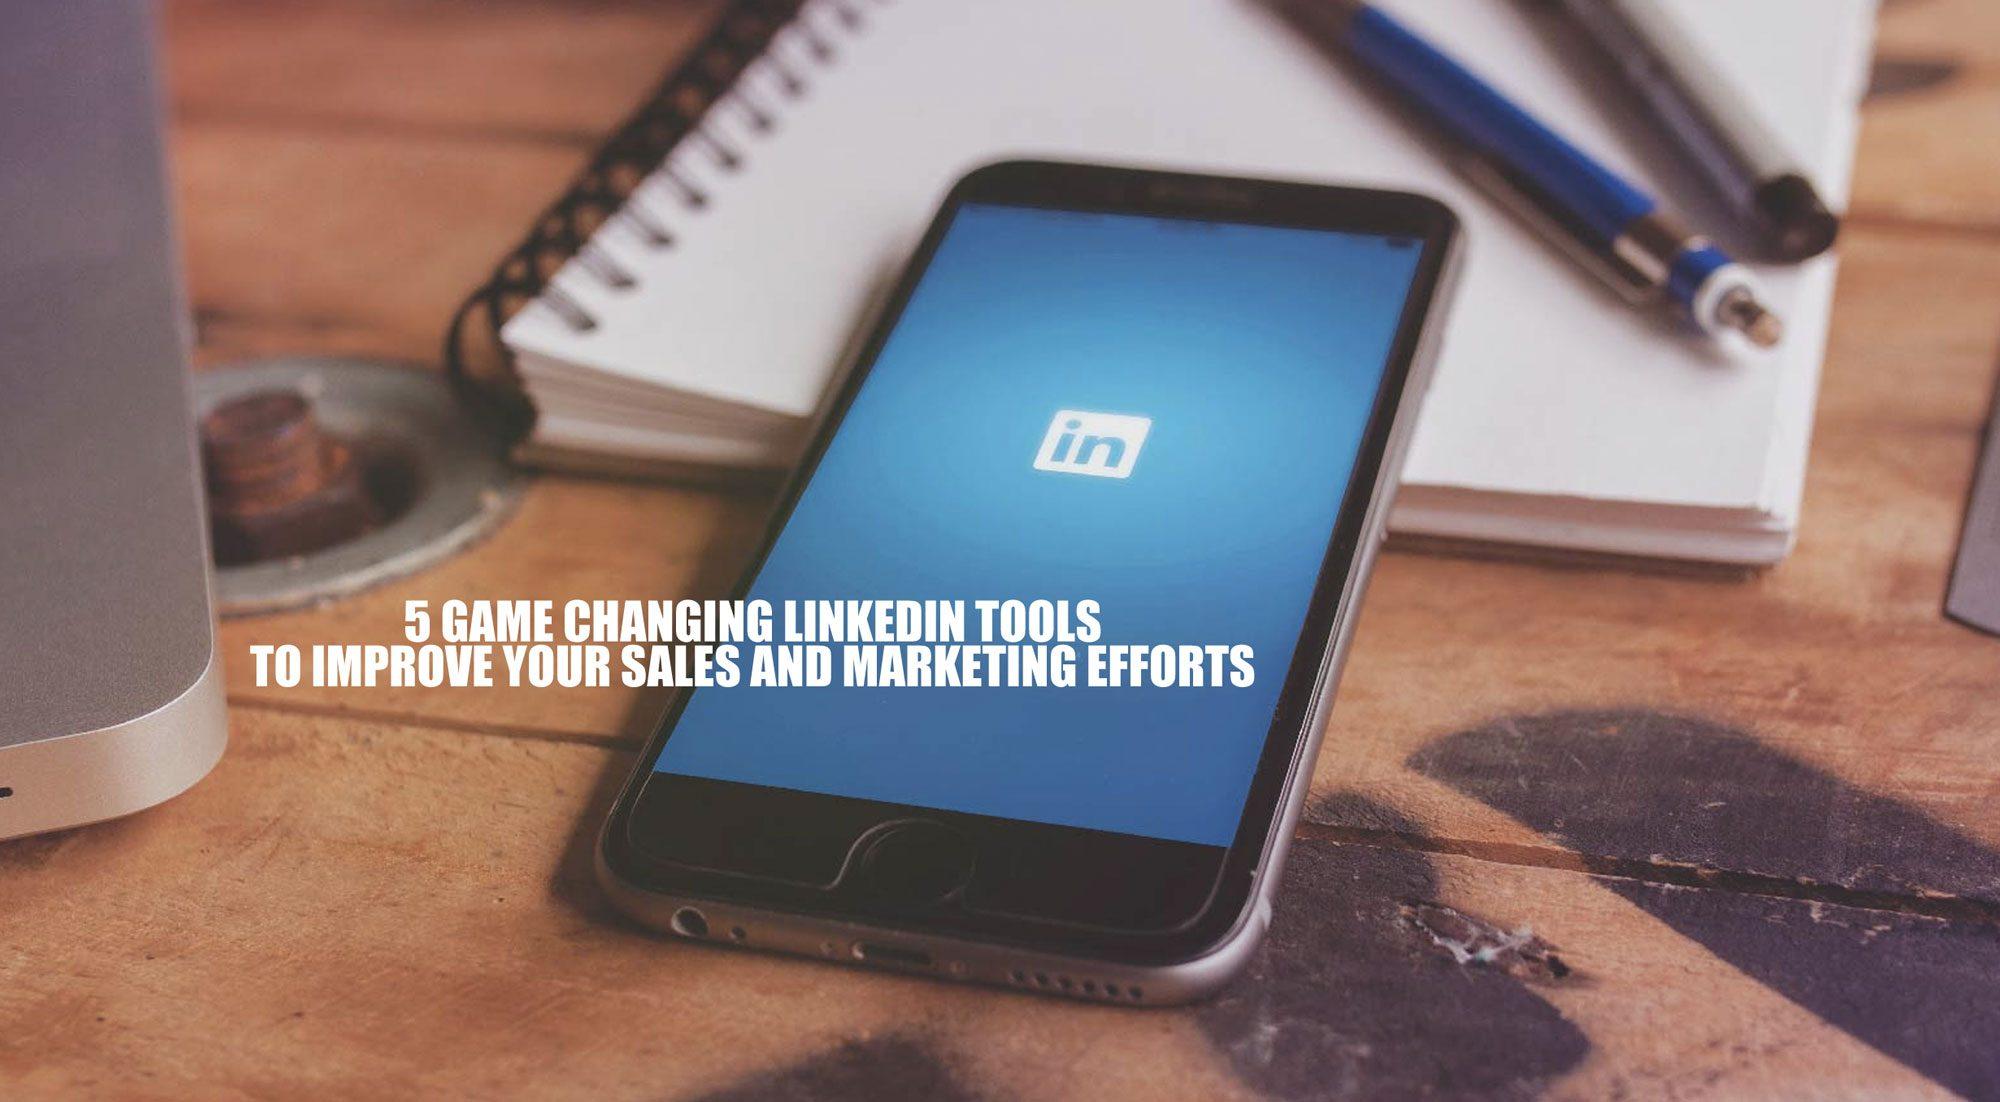 5 Game Changing LinkedIn Tools To Improve Your Sales and Marketing Efforts-1marketingidea